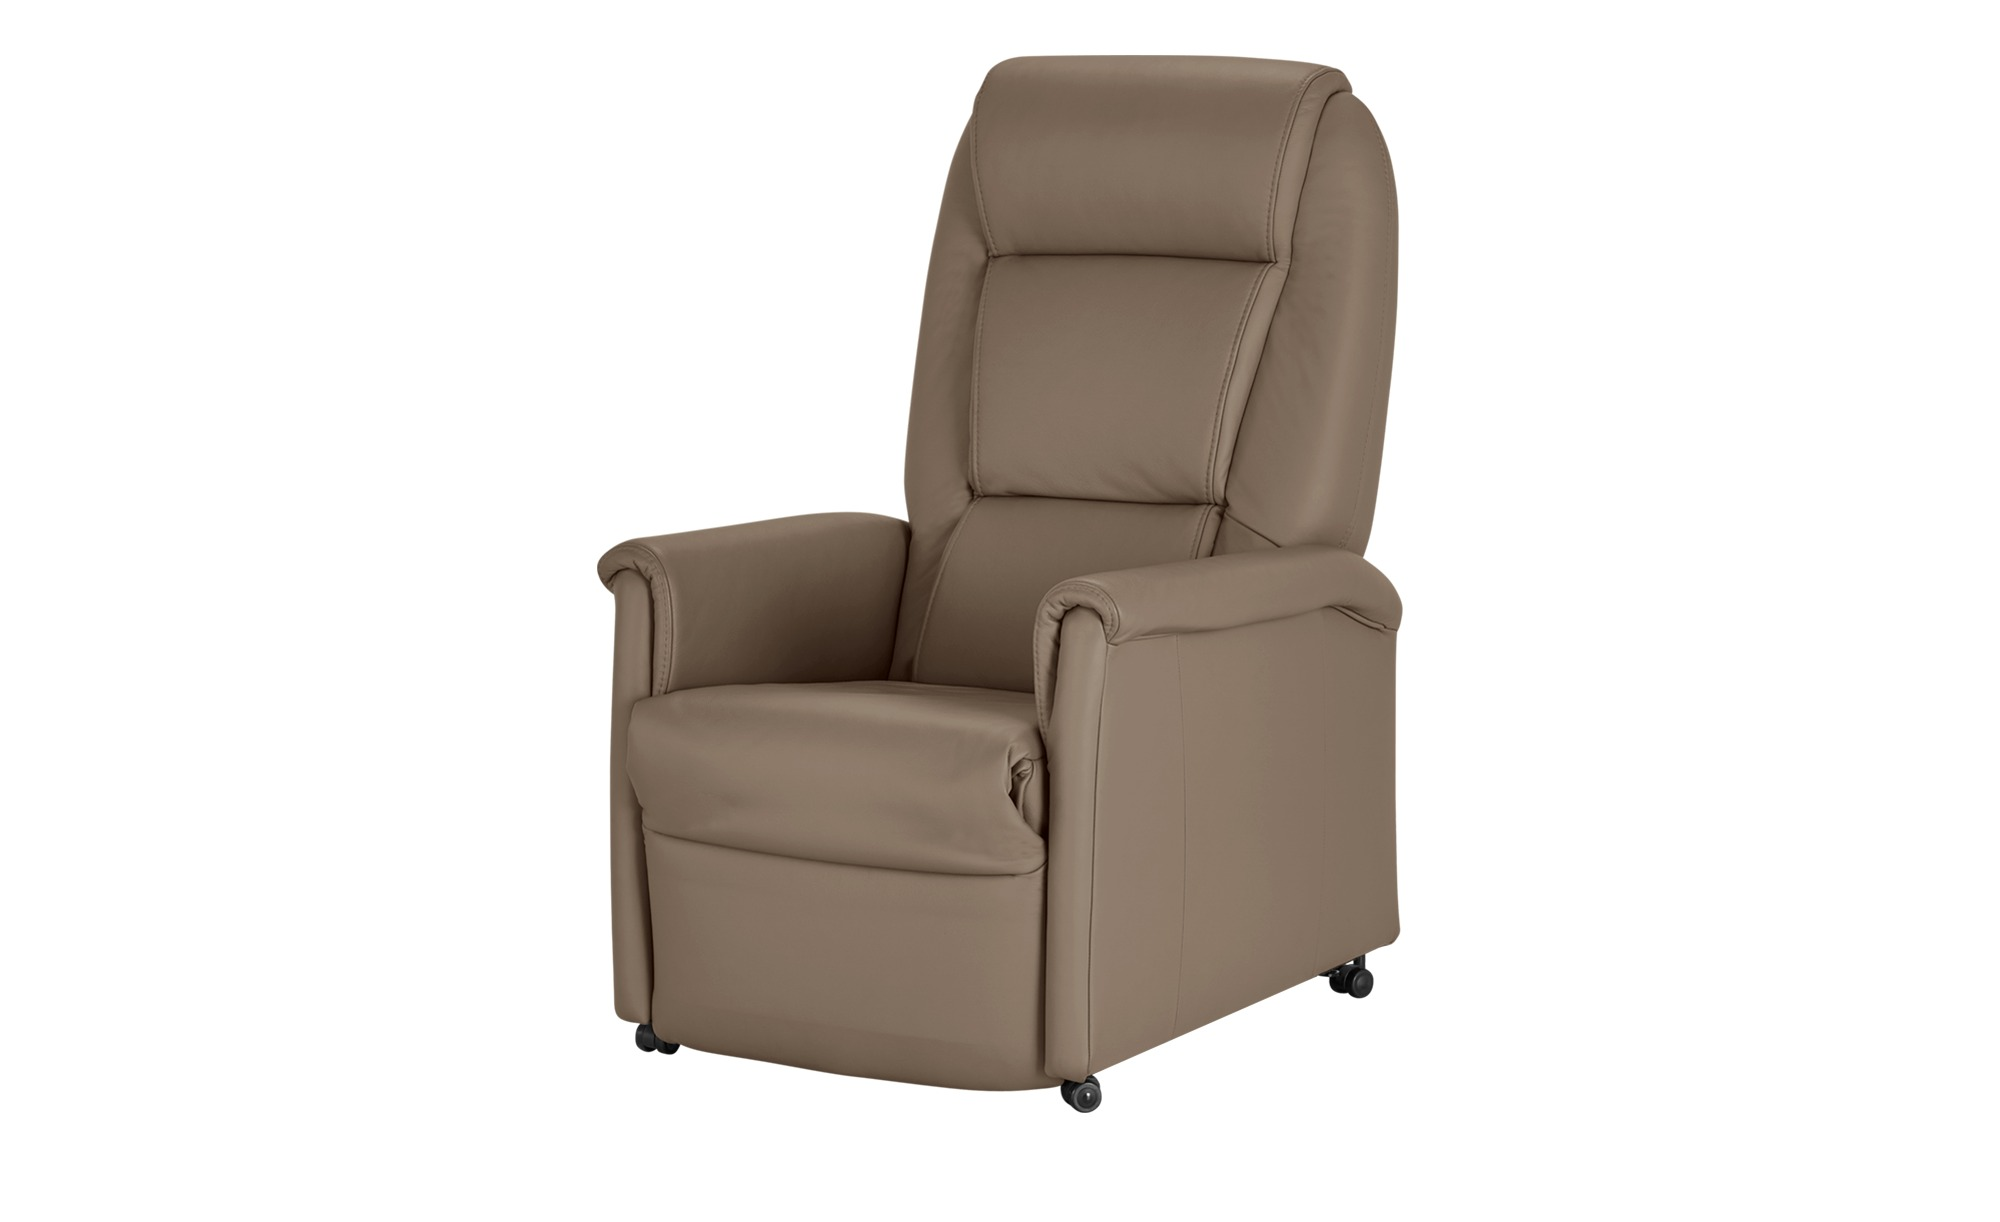 himolla Fernsehsessel  9773 - braun - 69 cm - 105 cm - 82 cm - Polstermöbel > Sessel > Fernsehsessel - Möbel Kraft | Wohnzimmer > Sessel > Fernsehsessel | himolla